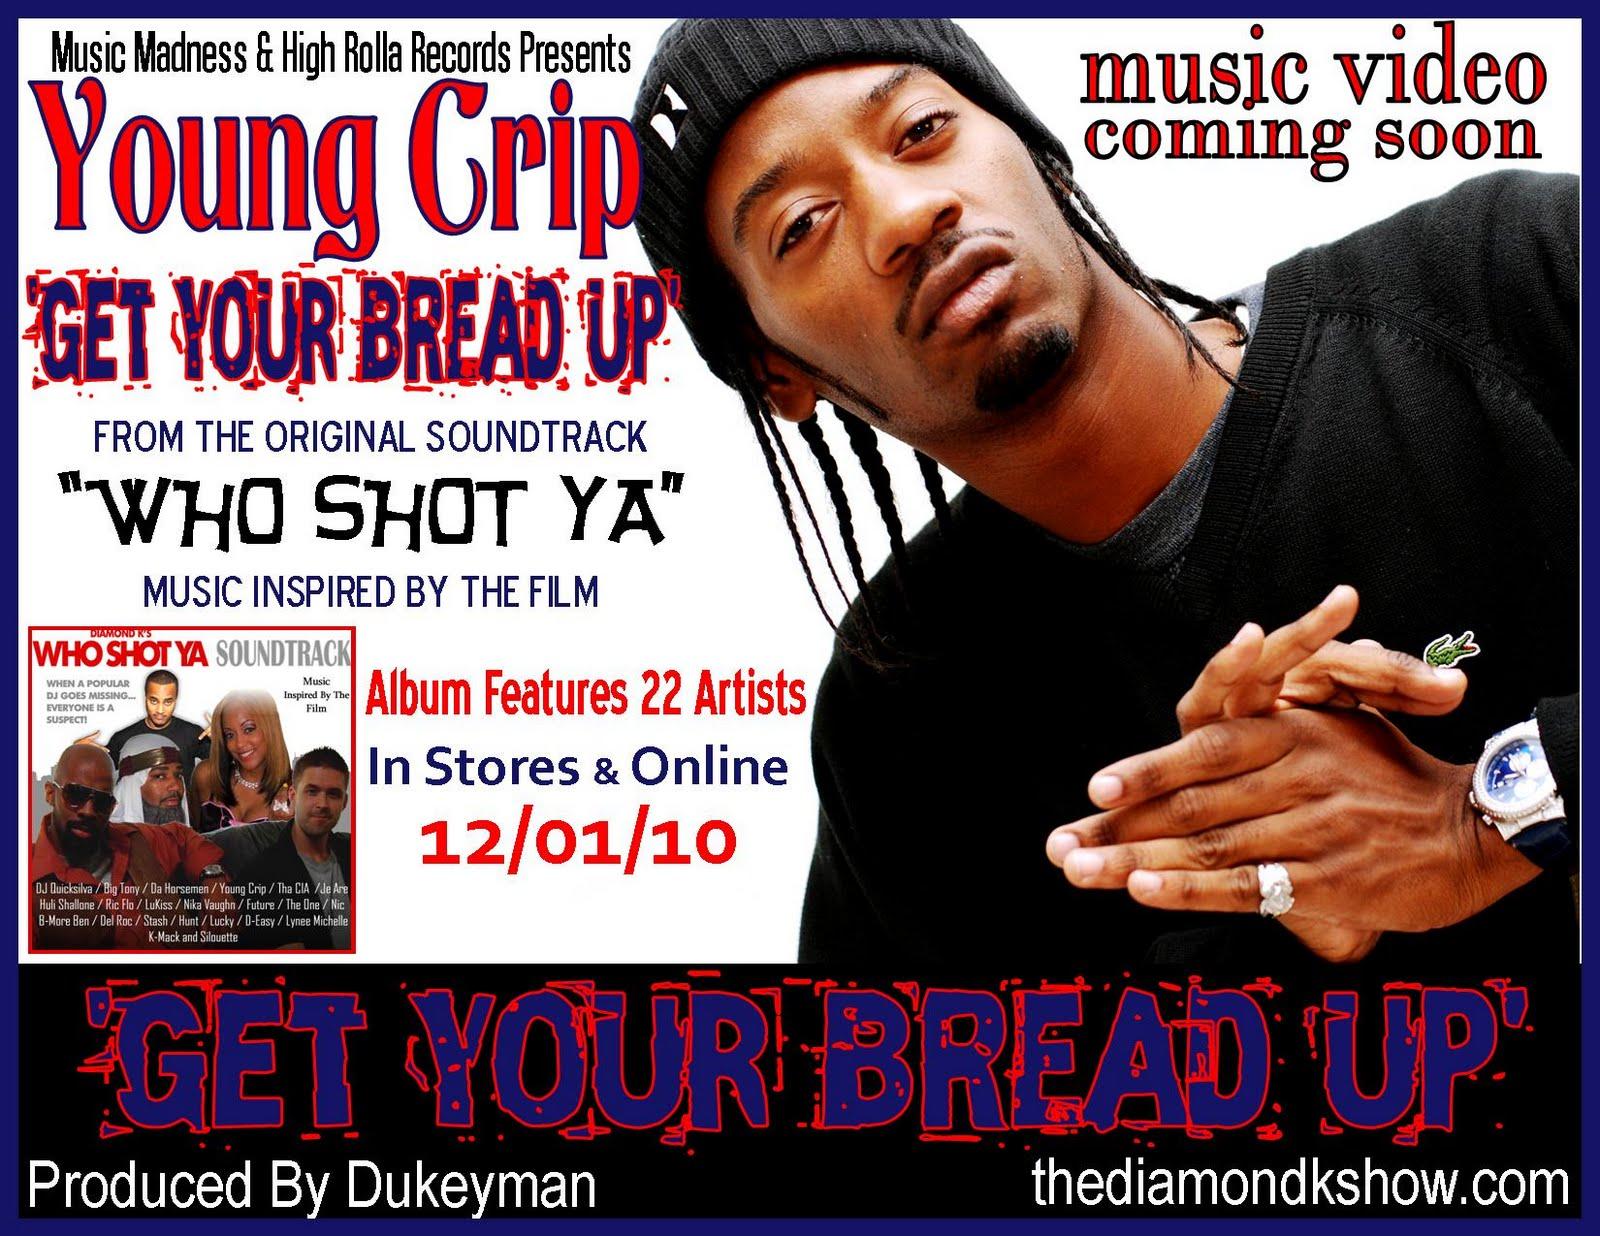 http://2.bp.blogspot.com/_zD-zh2jtvZU/TNRWR5vAa1I/AAAAAAAAB2o/2HjoA5K1s5s/s1600/Young+Crip+Flyer.jpg